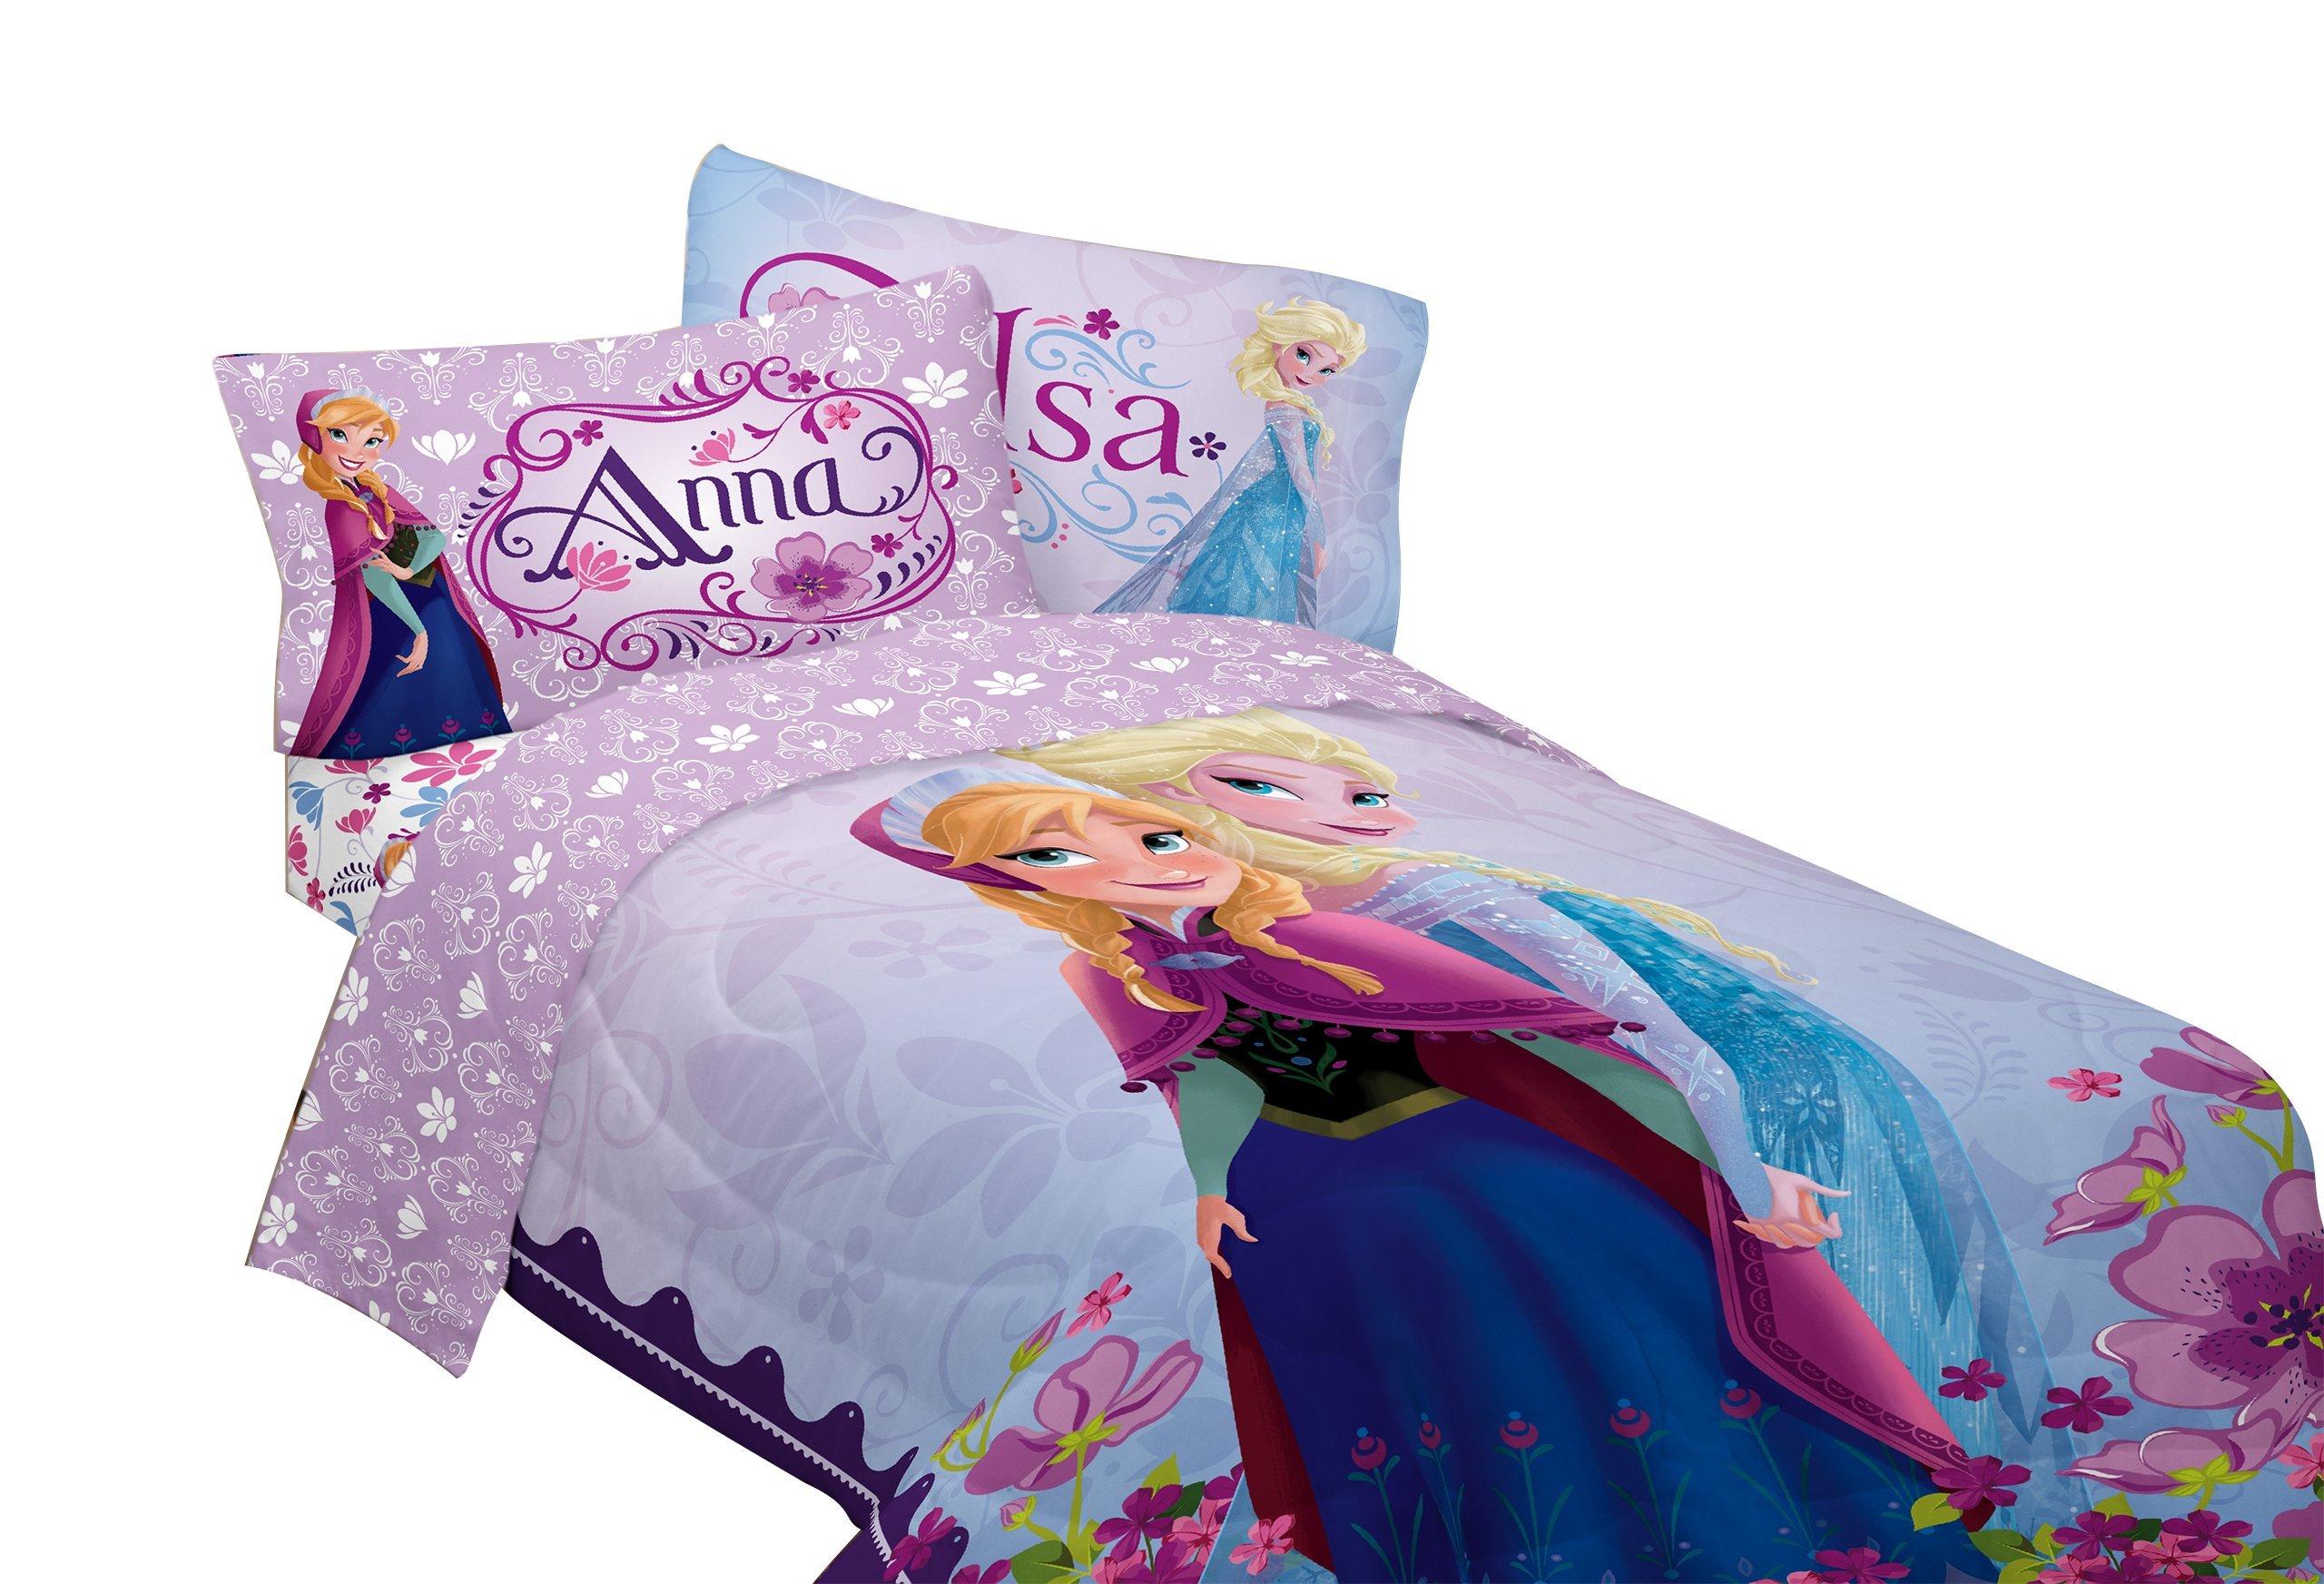 Disney Frozen Celebrate Love 76-Inch by 86-Inch Microfiber Reversible Comforter, Full